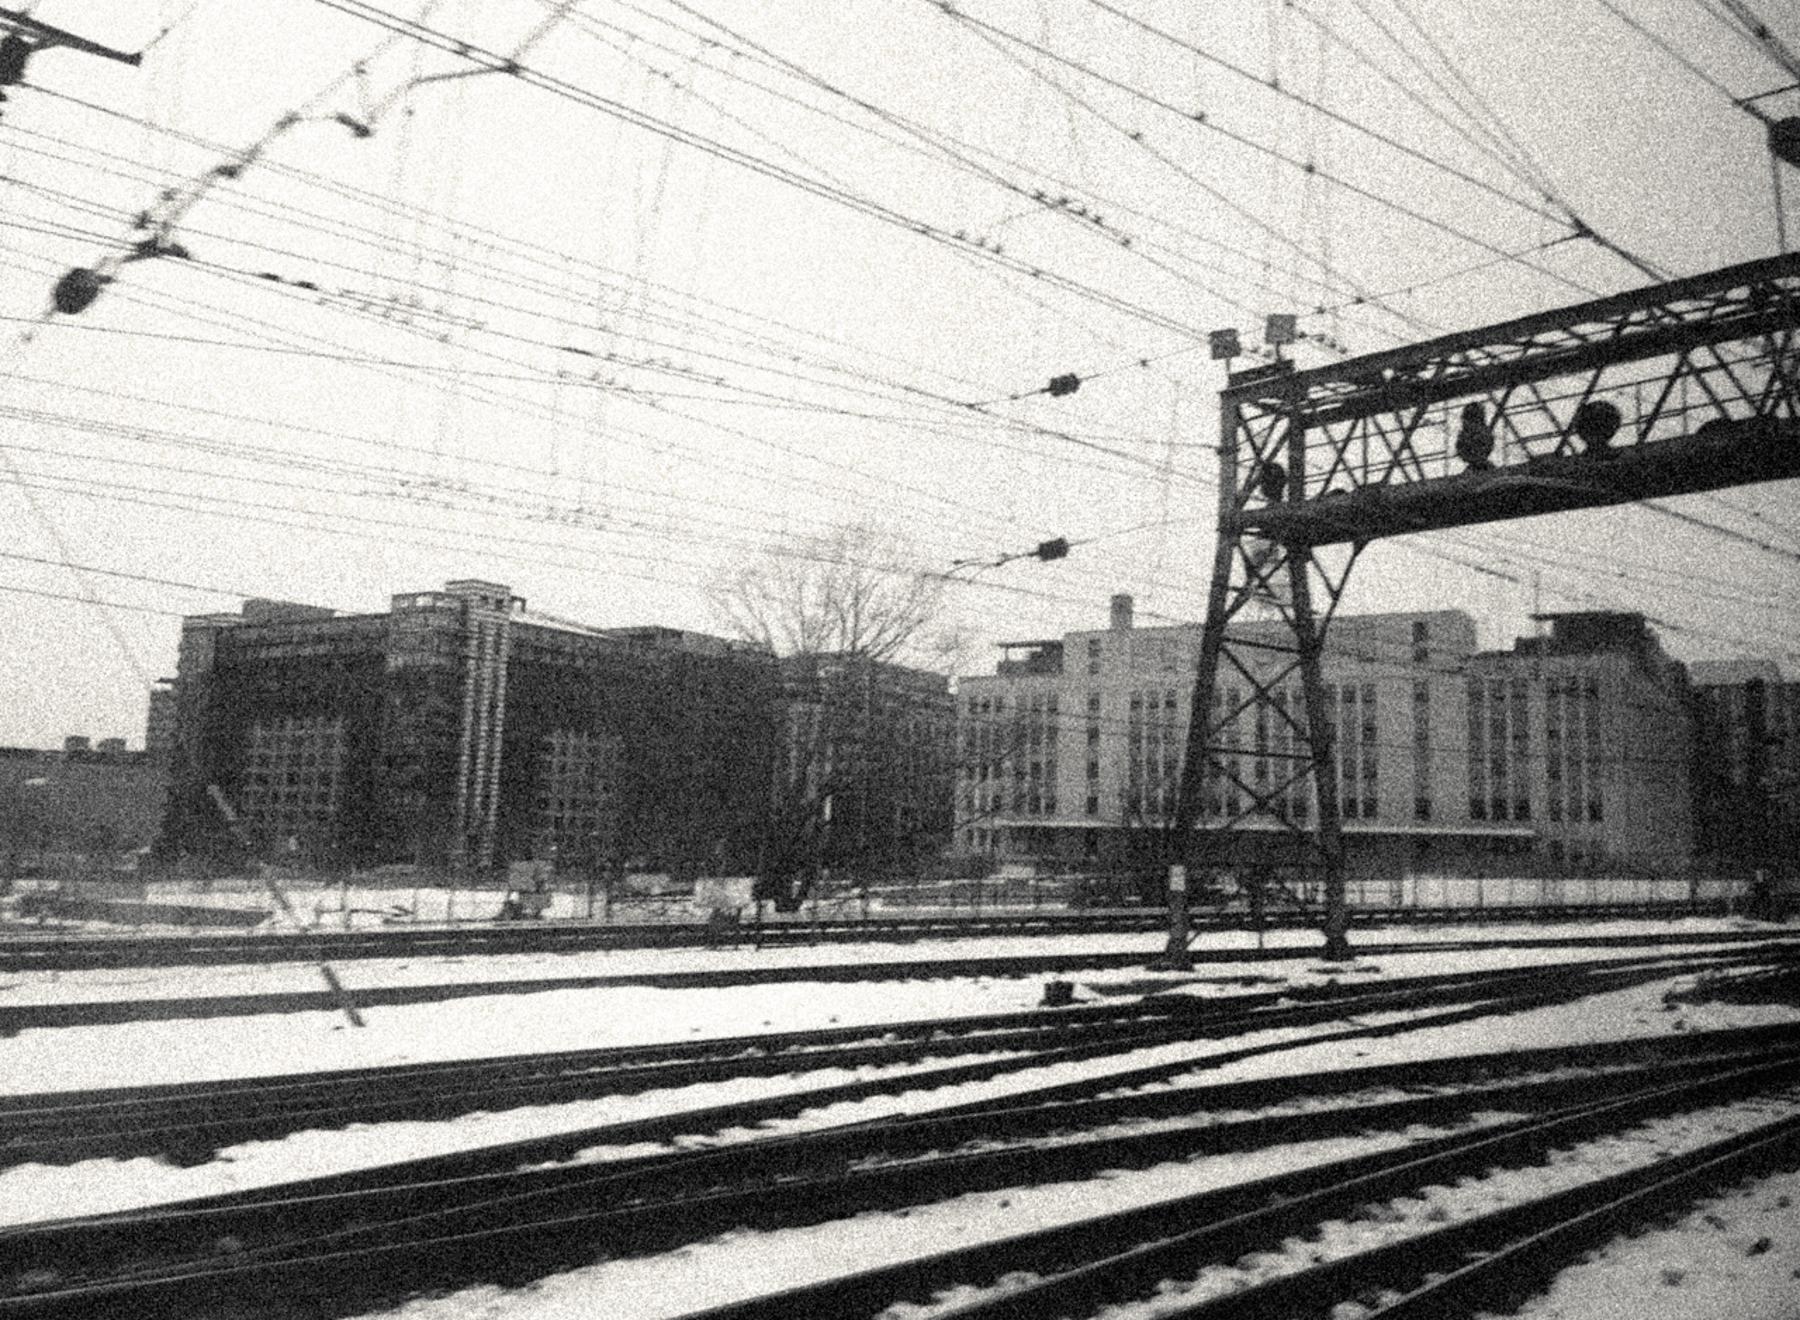 Rebekah_Helton_Winter_Tracks.jpg